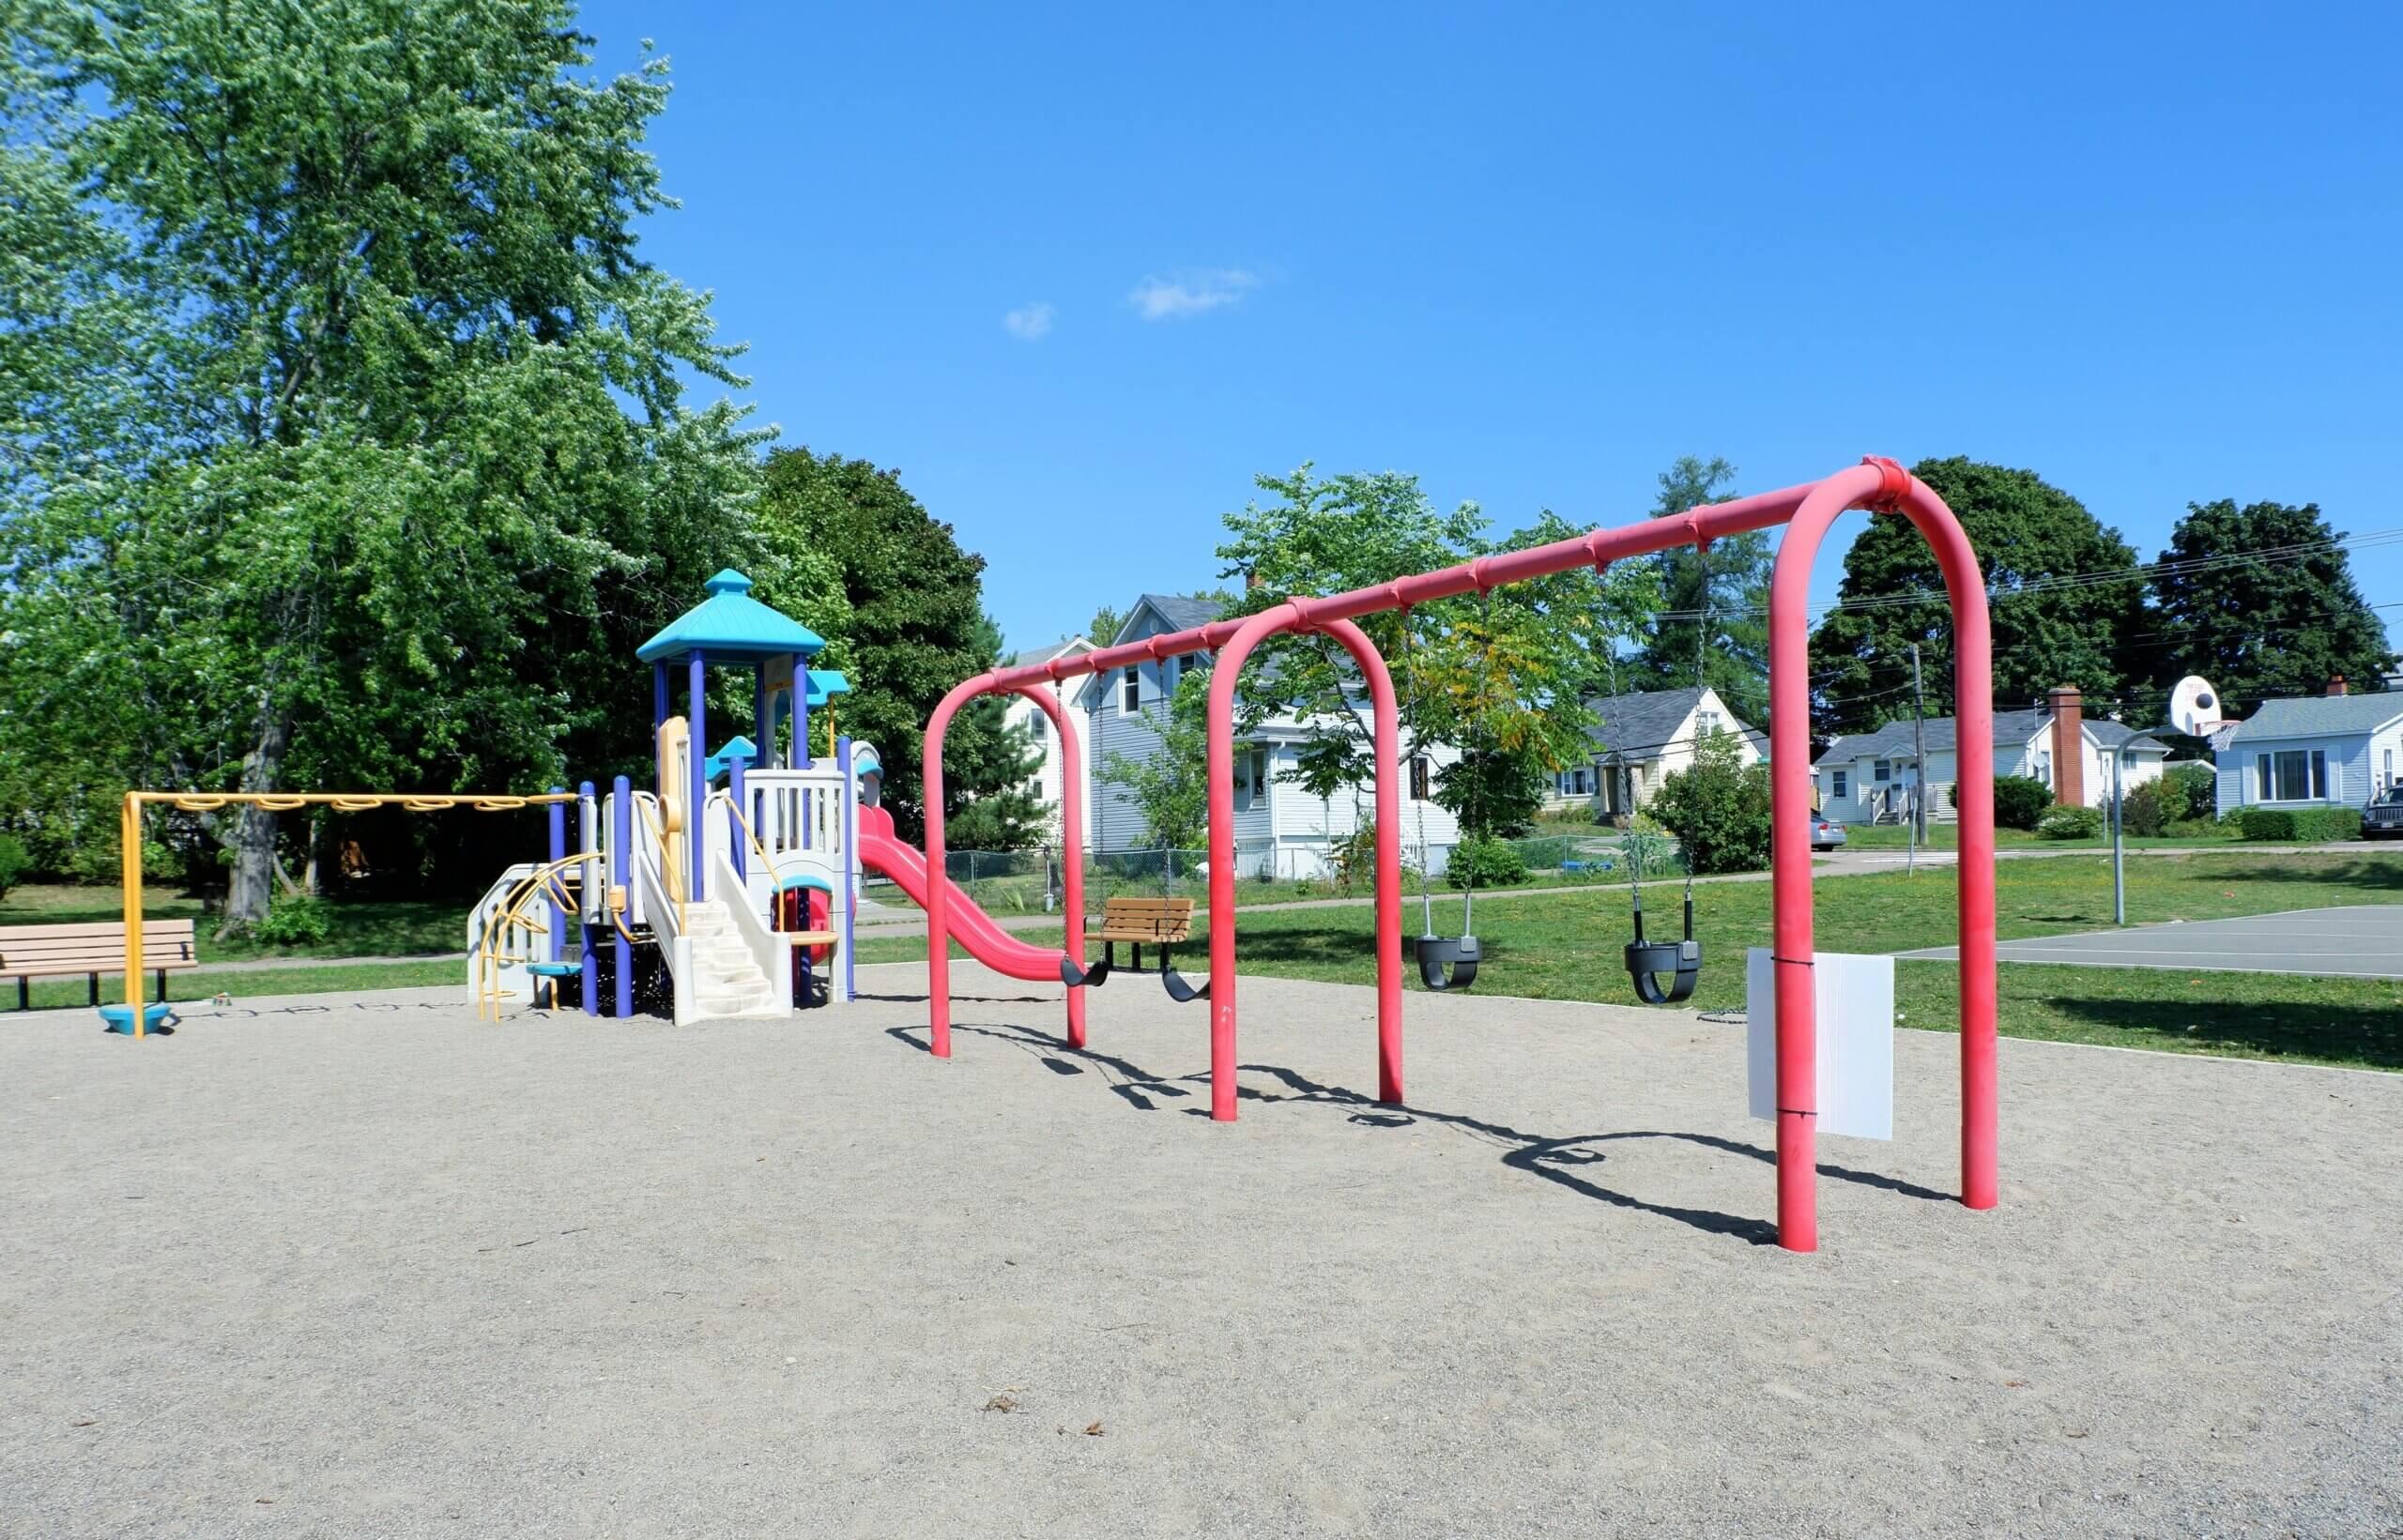 Braemar Park Centre Street Playground Moncton Pickle Planet swings